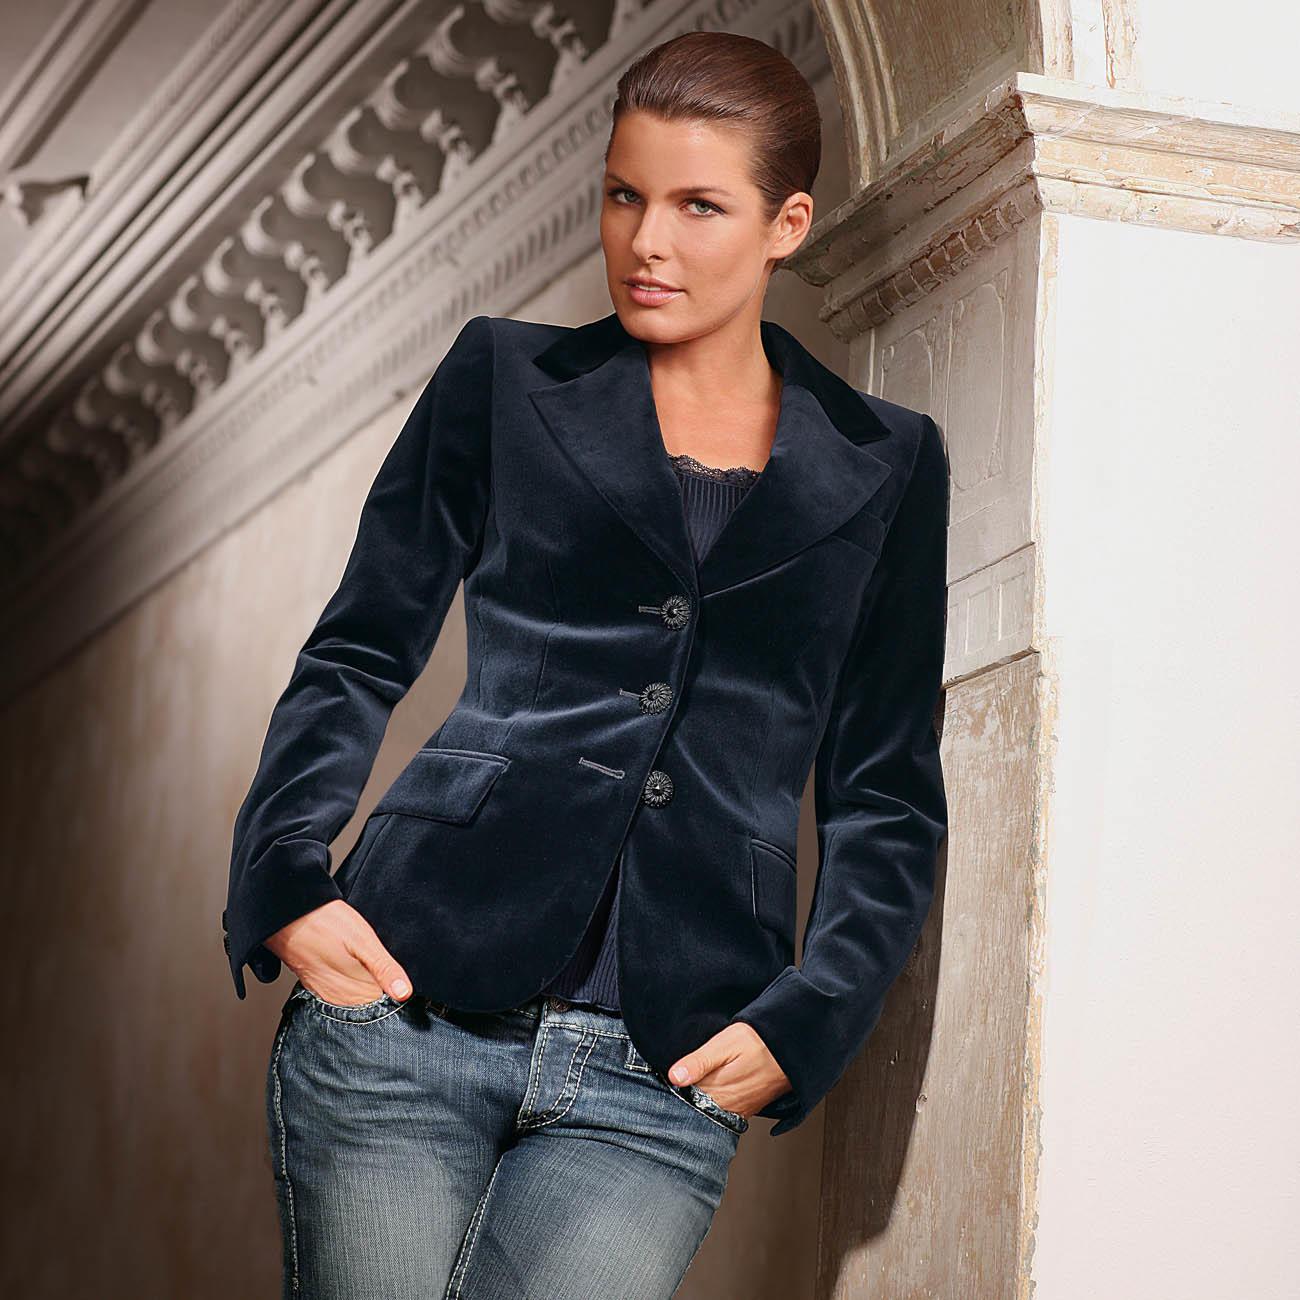 bester Wert an vorderster Front der Zeit riesige Auswahl an Waschbarer Samtblazer   Mode-Klassiker entdecken